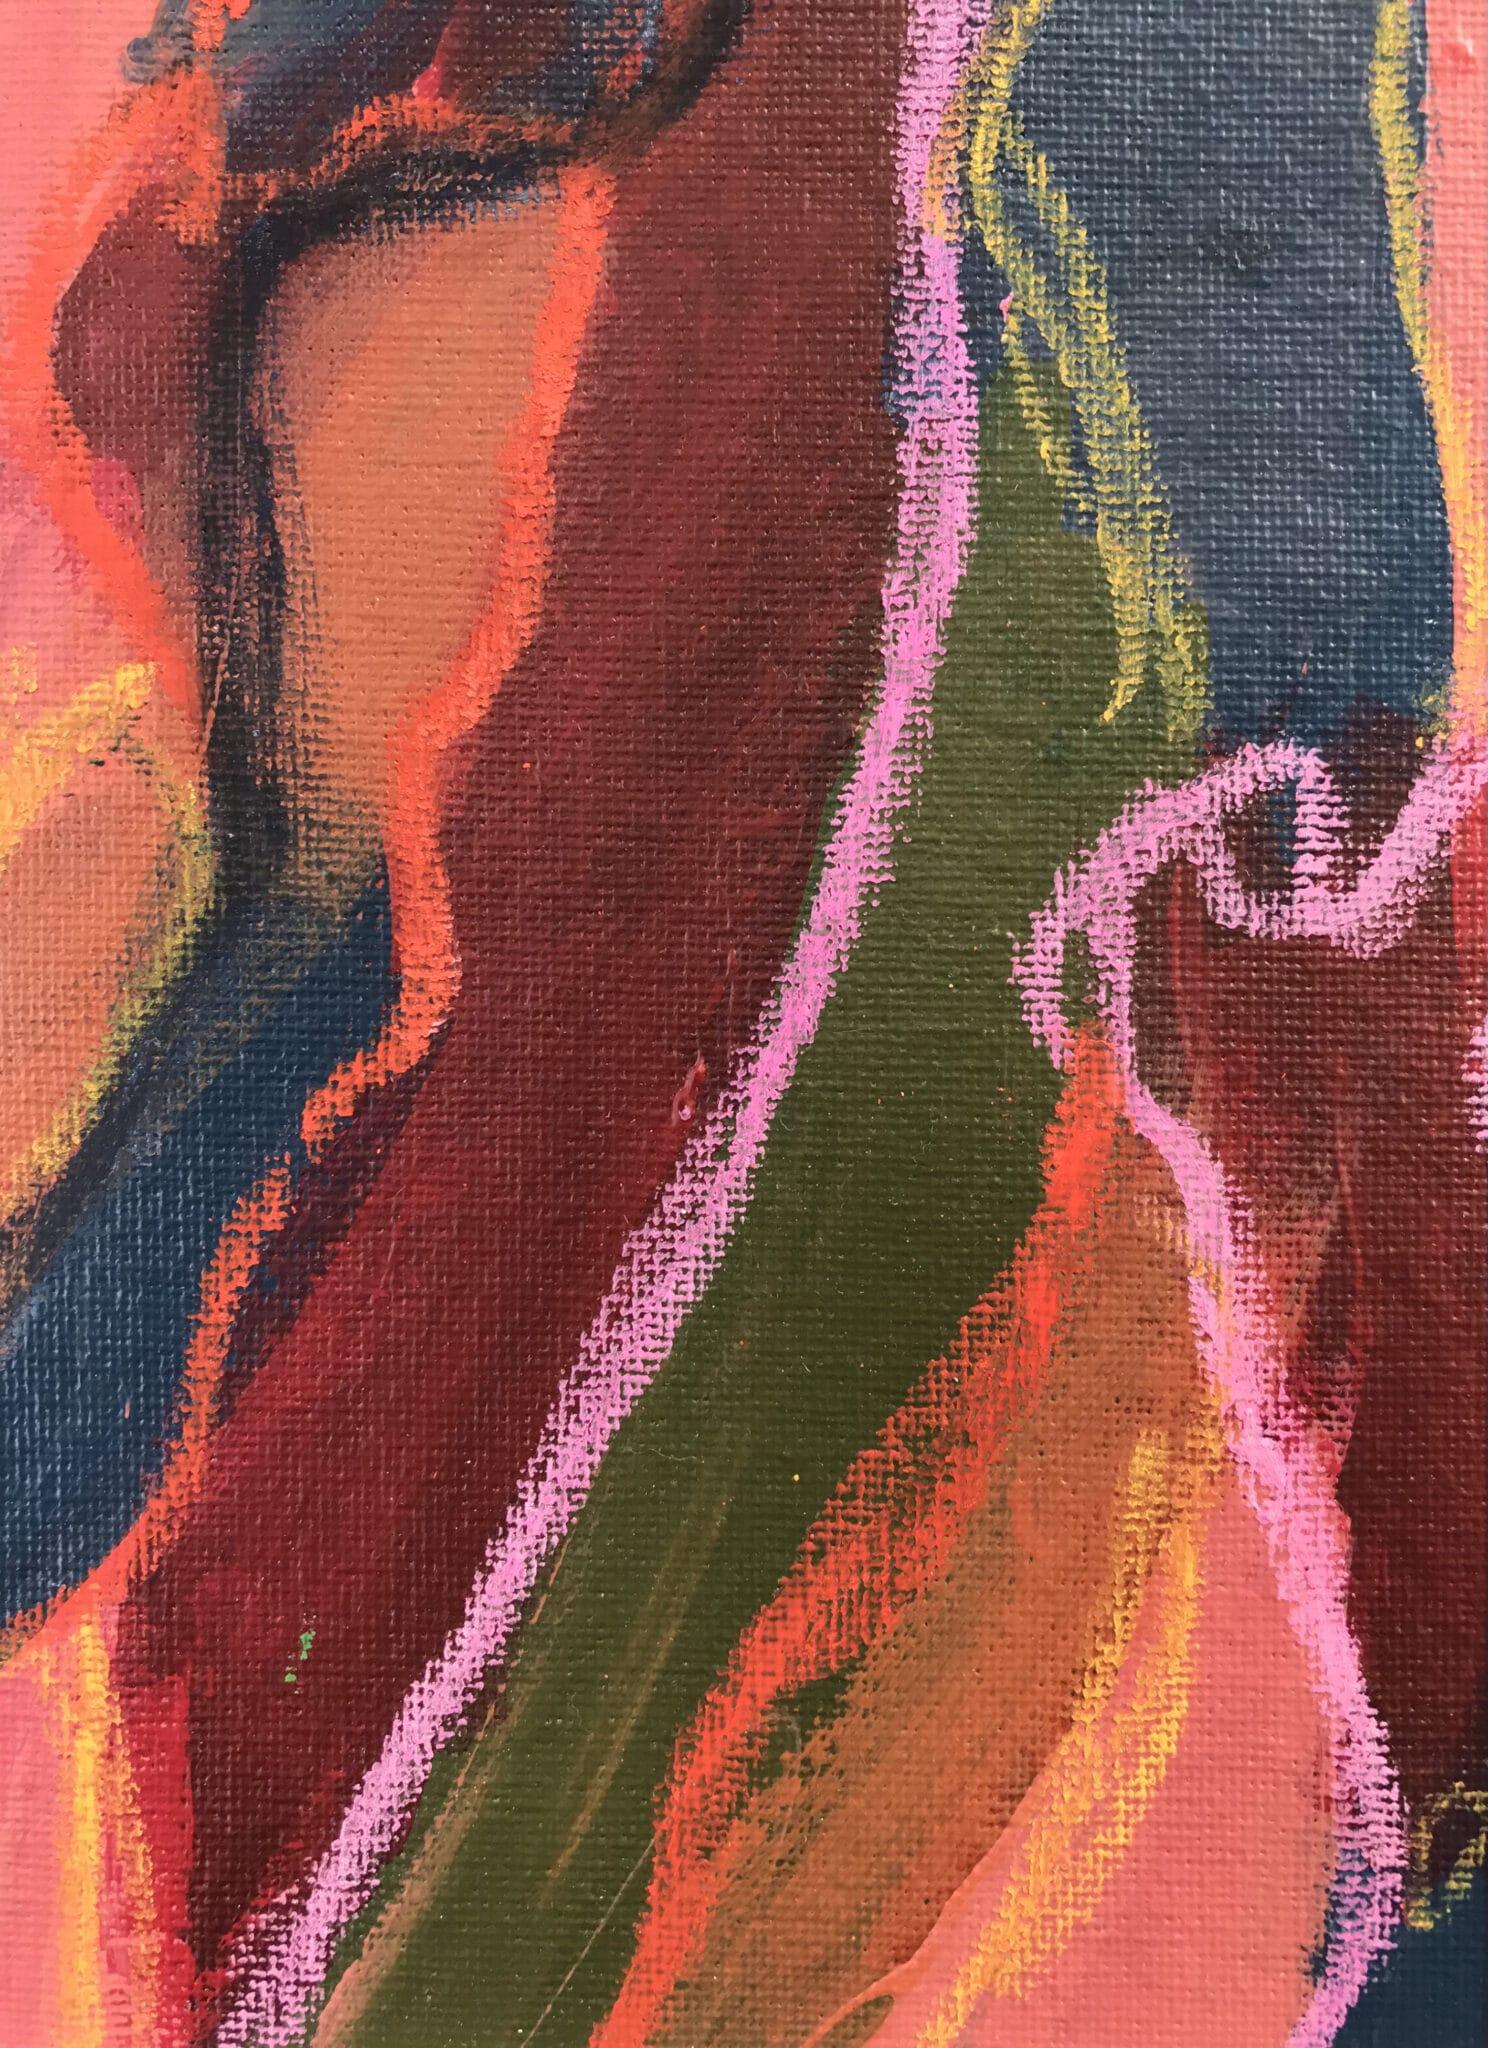 Colours Smash 2 – Mixed Media Original Artwork Set By Tish Willo Creative